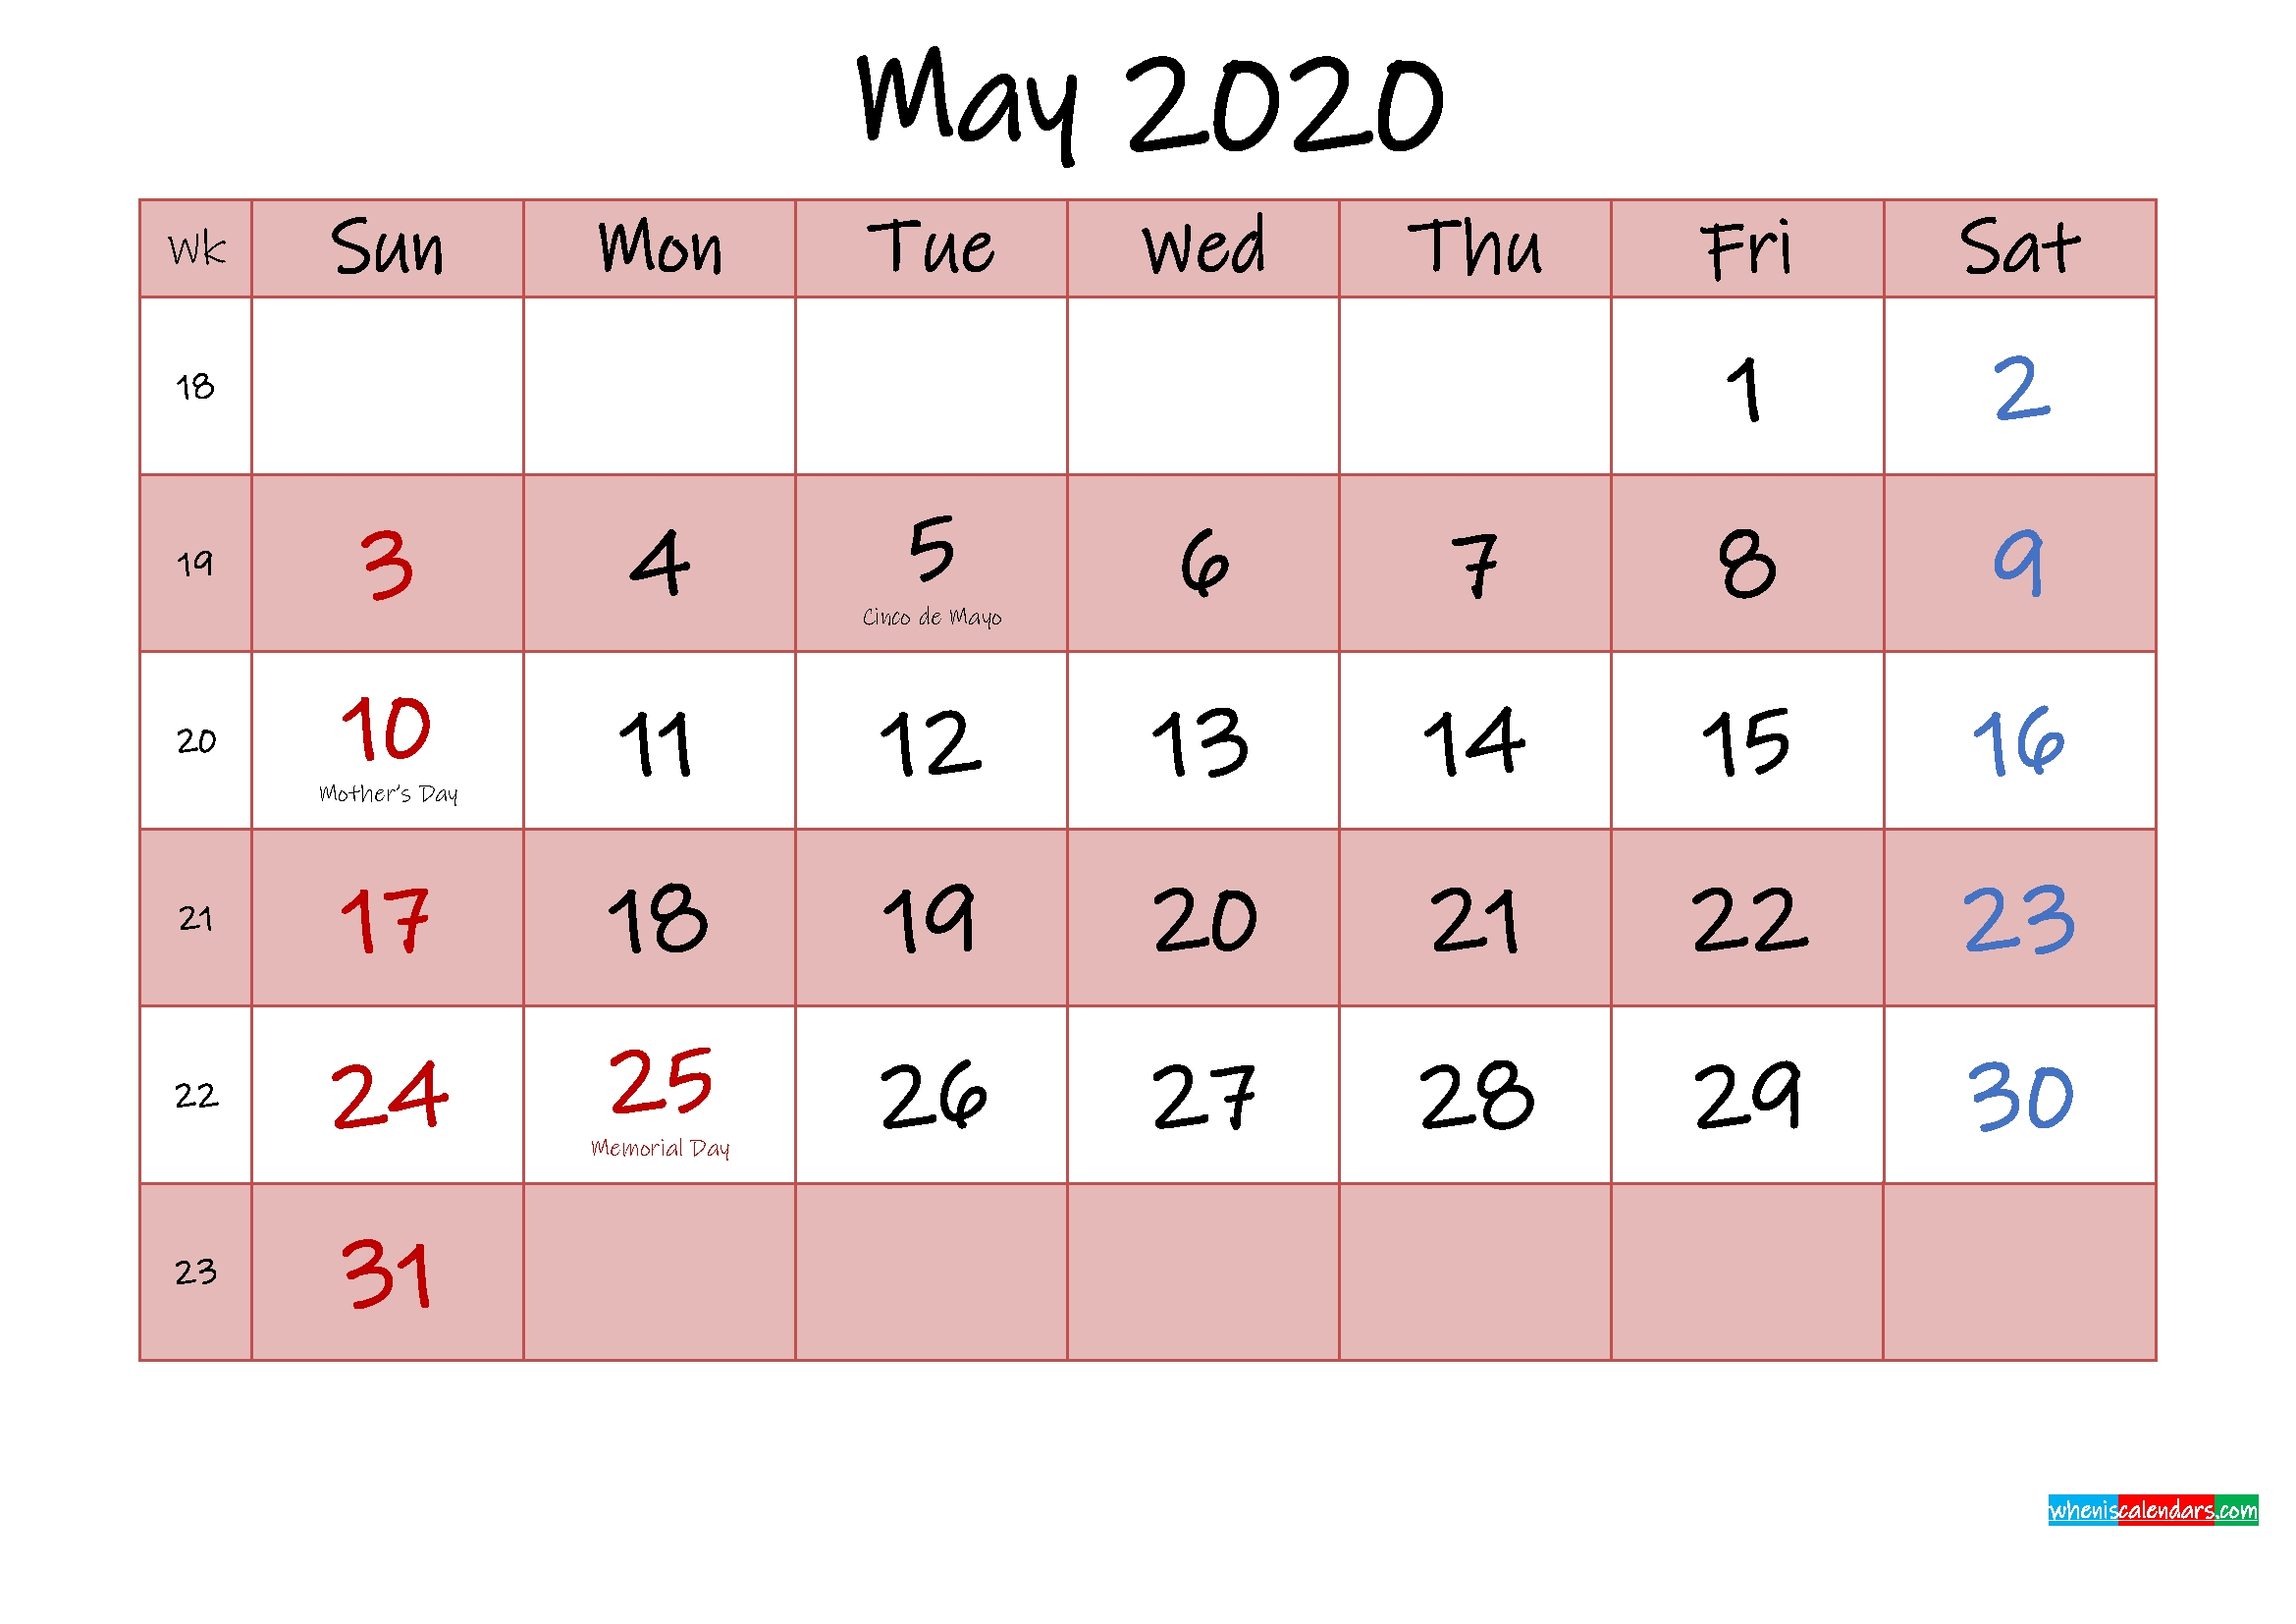 Free Printable Coloring Calendar 2020 May – Template No intended for Free Printable Coloring Calendar 2020